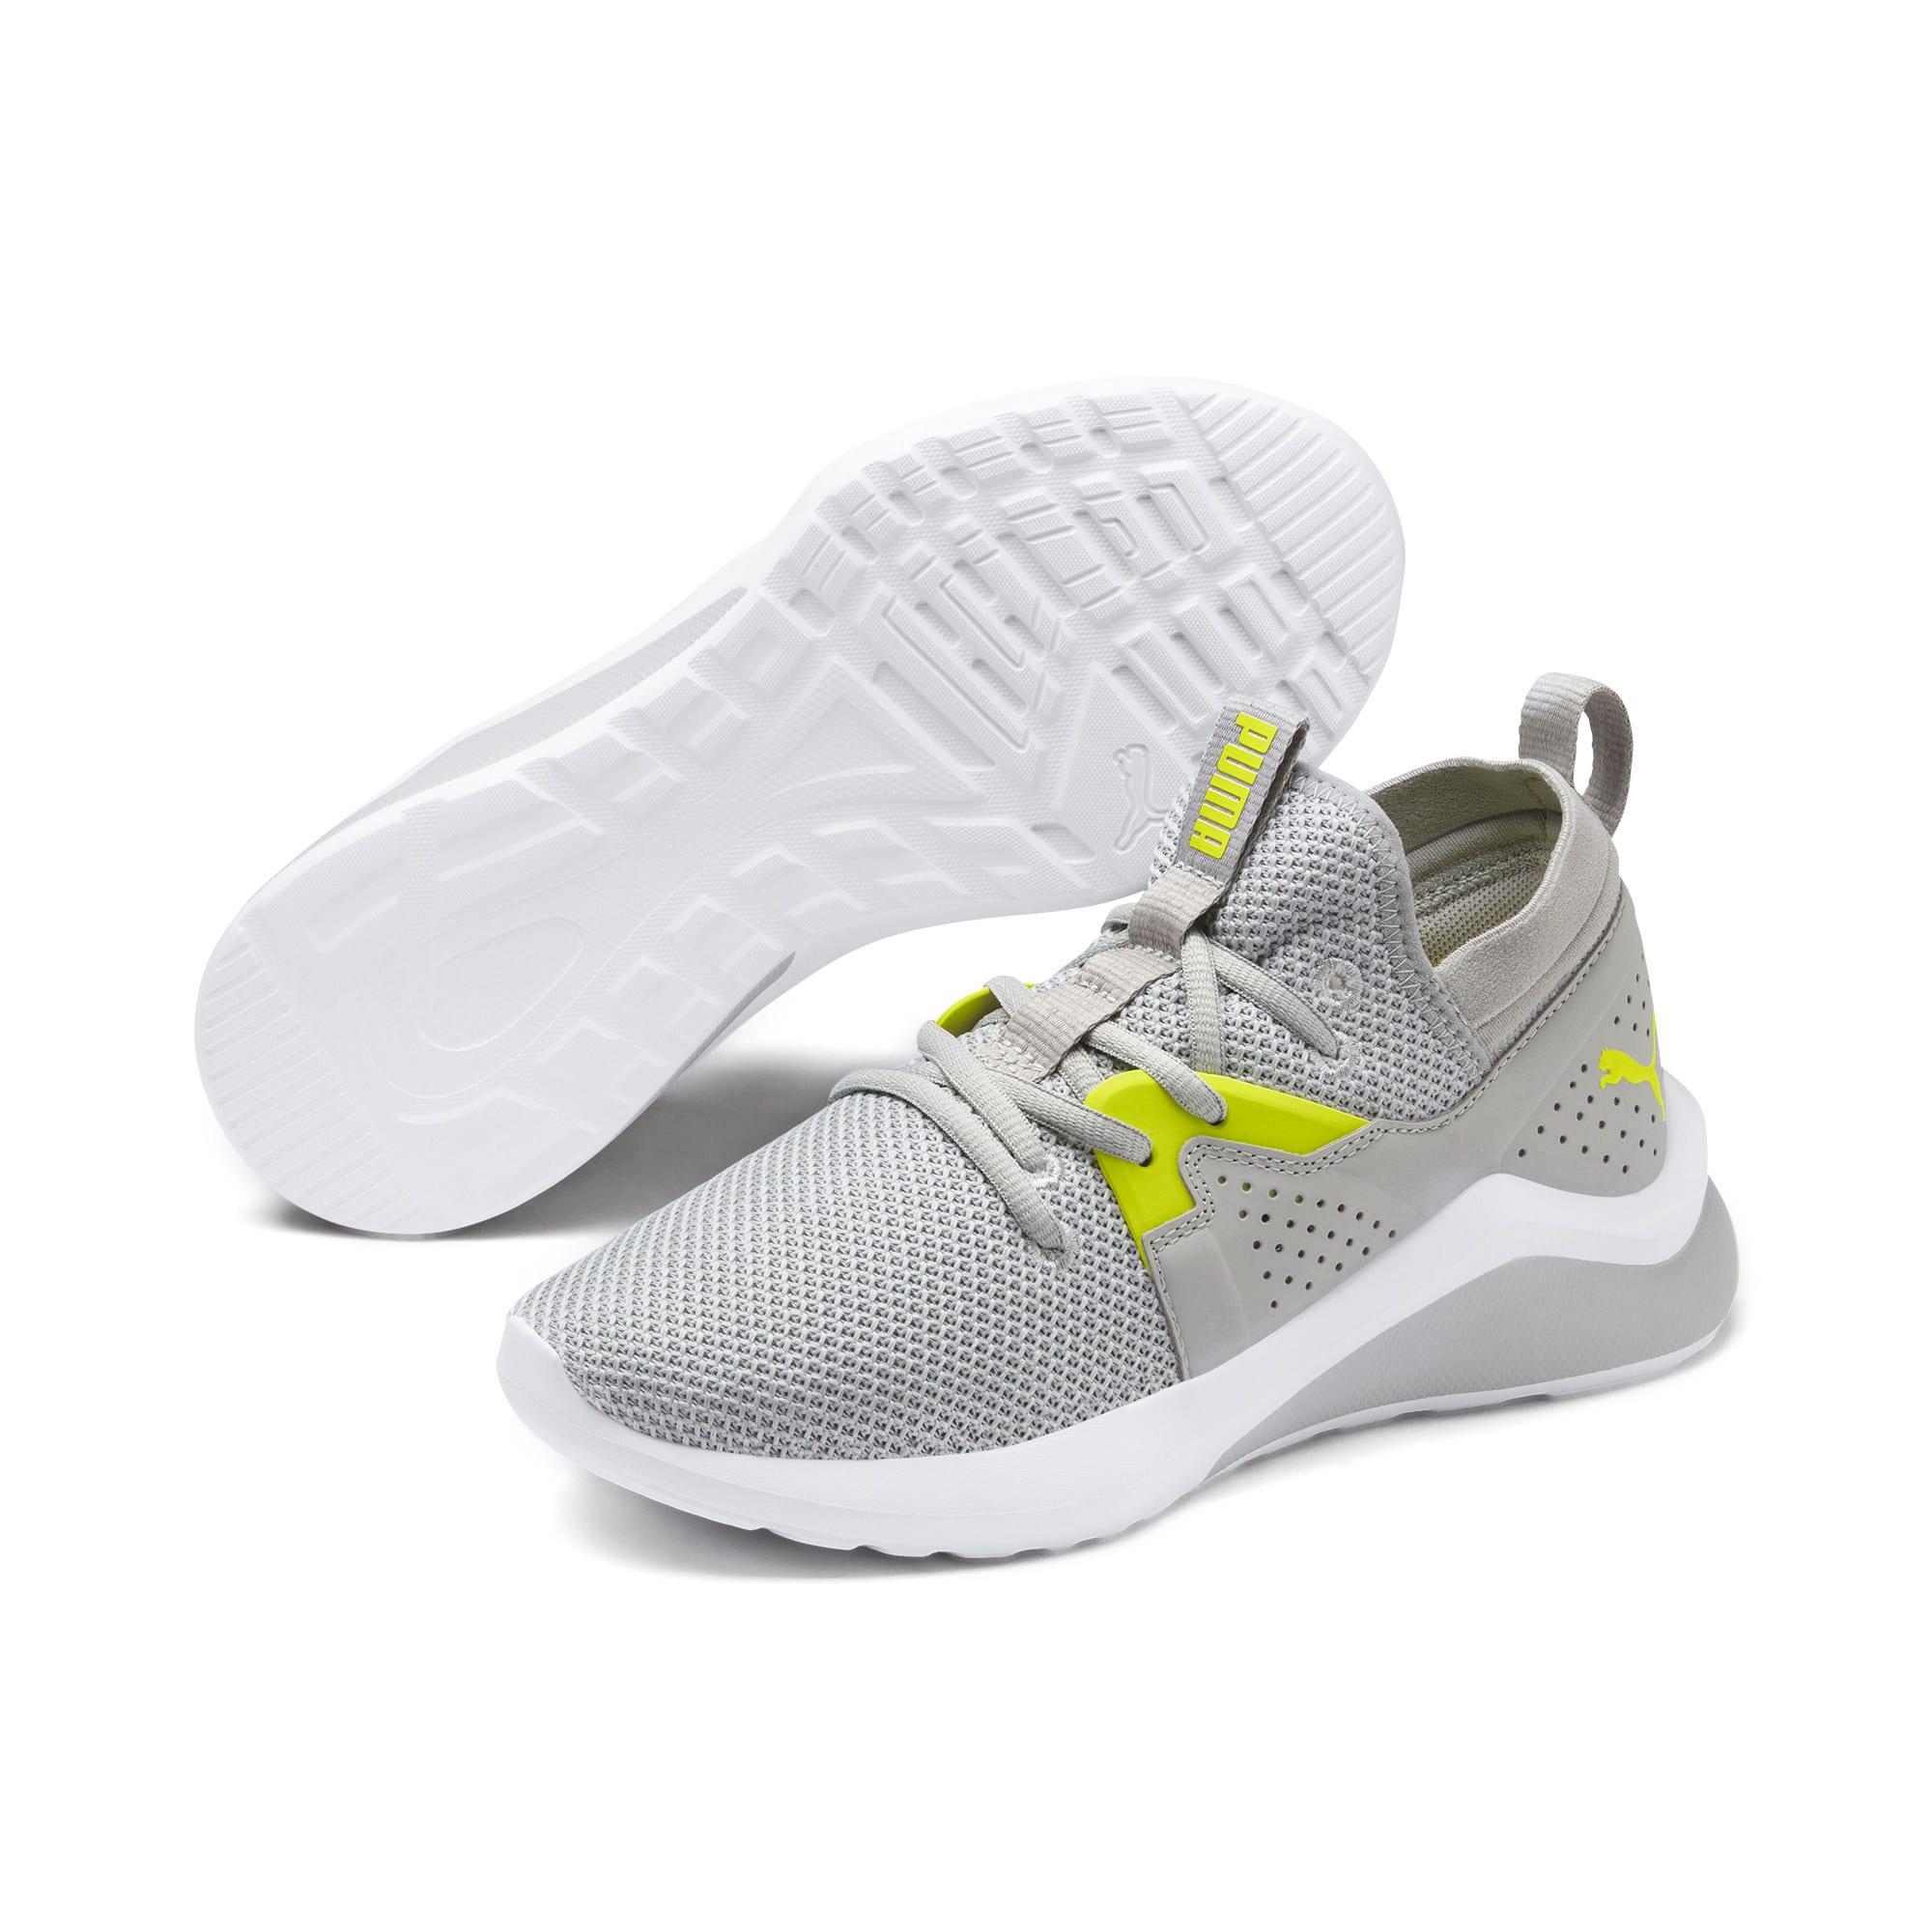 Thumbnail 2 of Emergence Sneakers JR, High Rise-Nrgy Yellow, medium